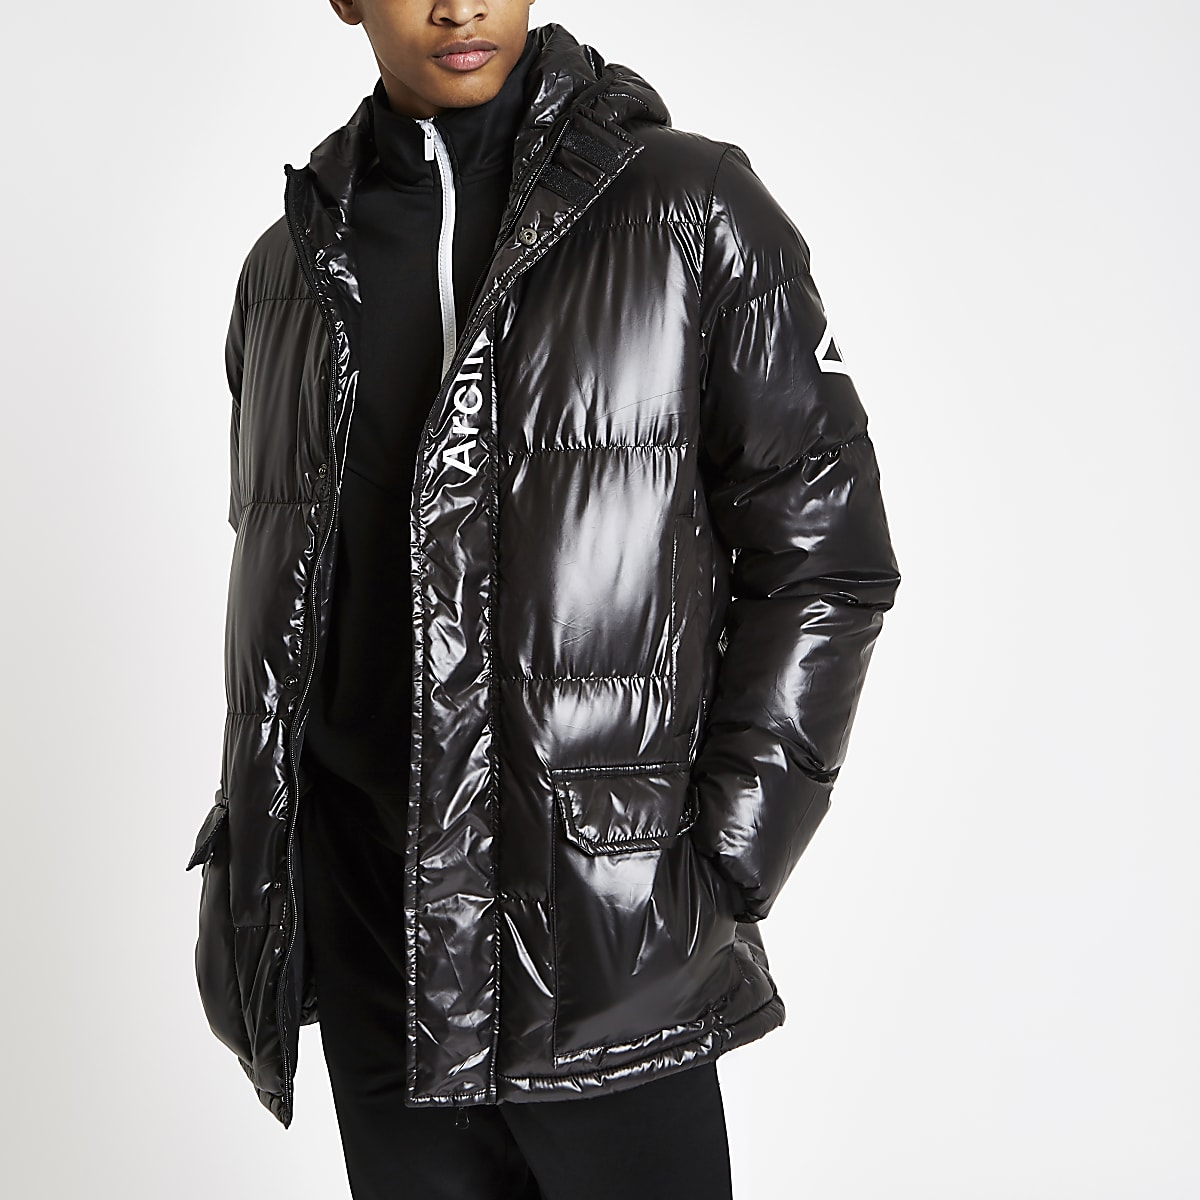 8a11a8aa5b15 Arcminute black quilted jacket - Coats - Coats & Jackets - men